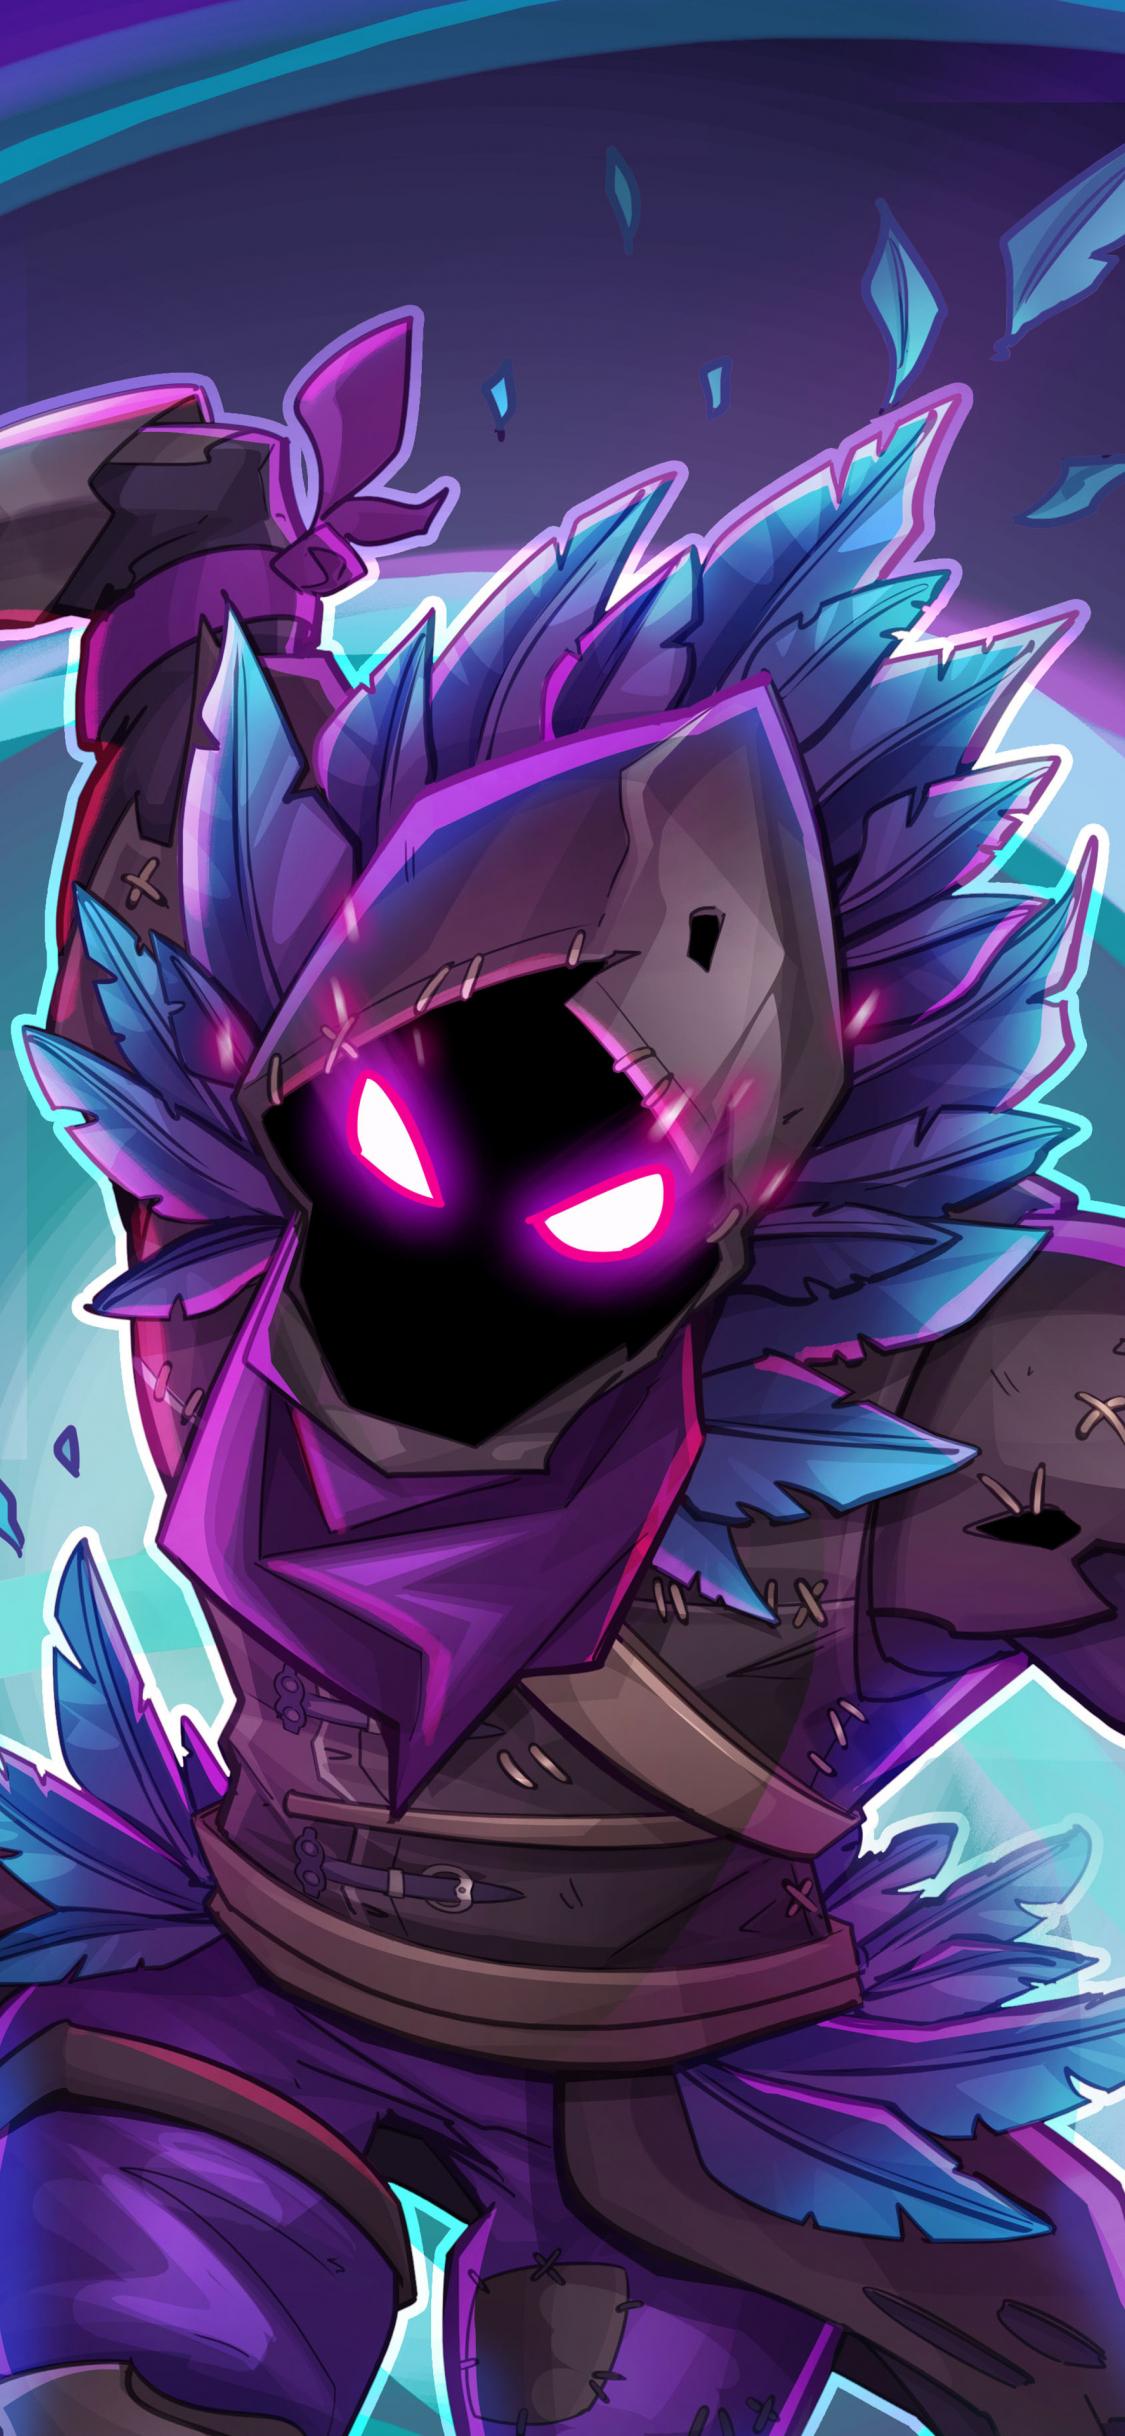 Download 1125x2436 Wallpaper Raven Fortnite Battle Royale